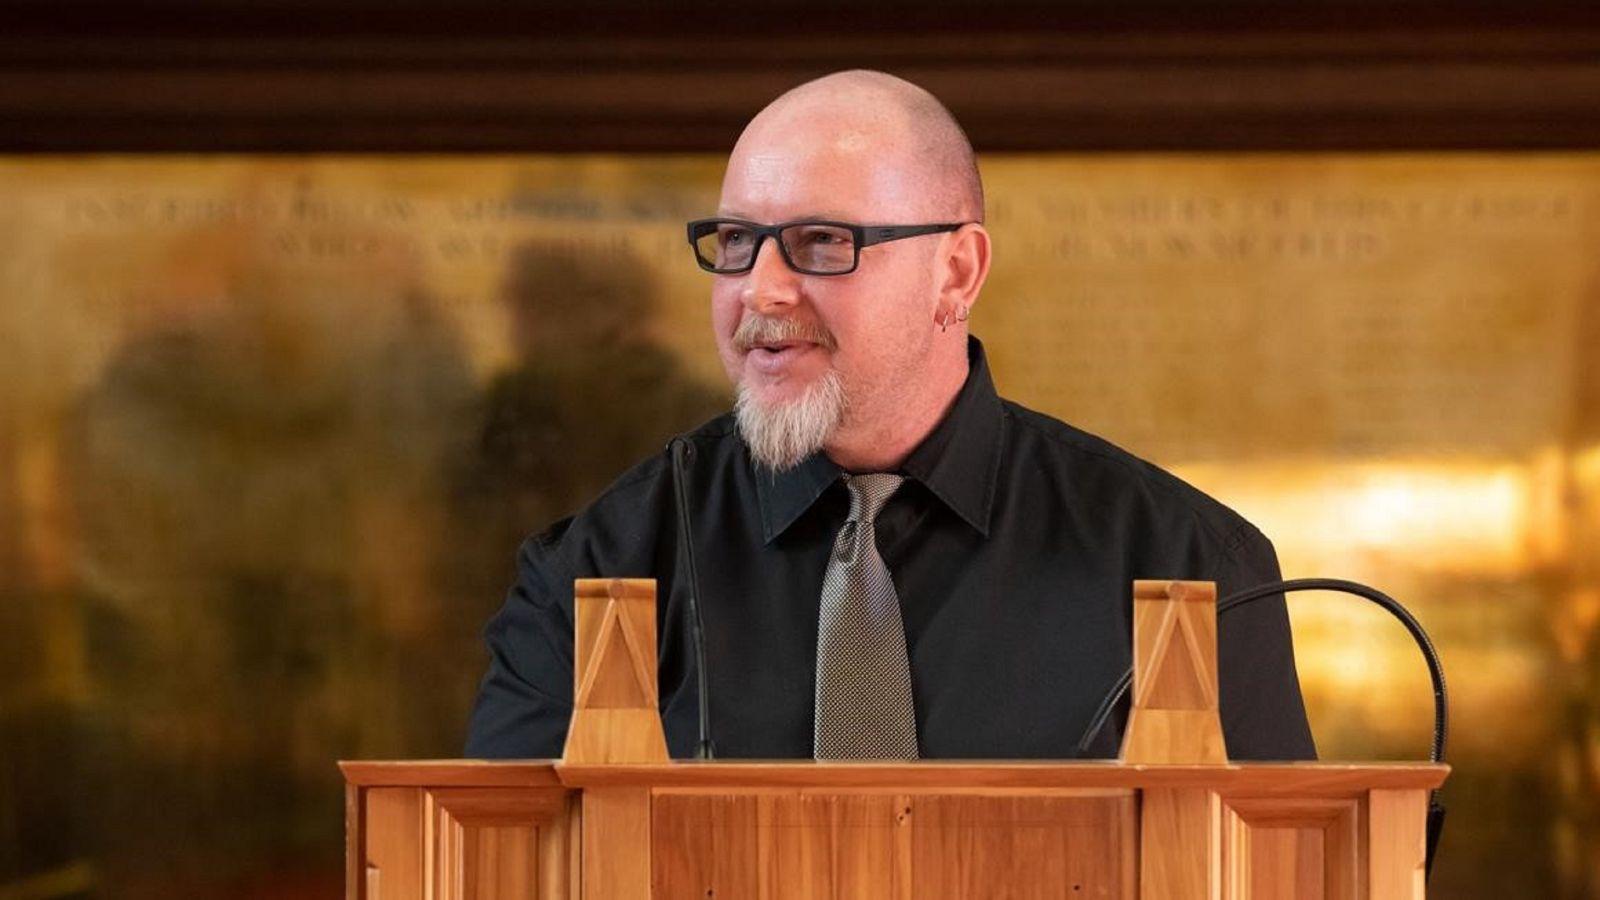 Dr Chris Bowden